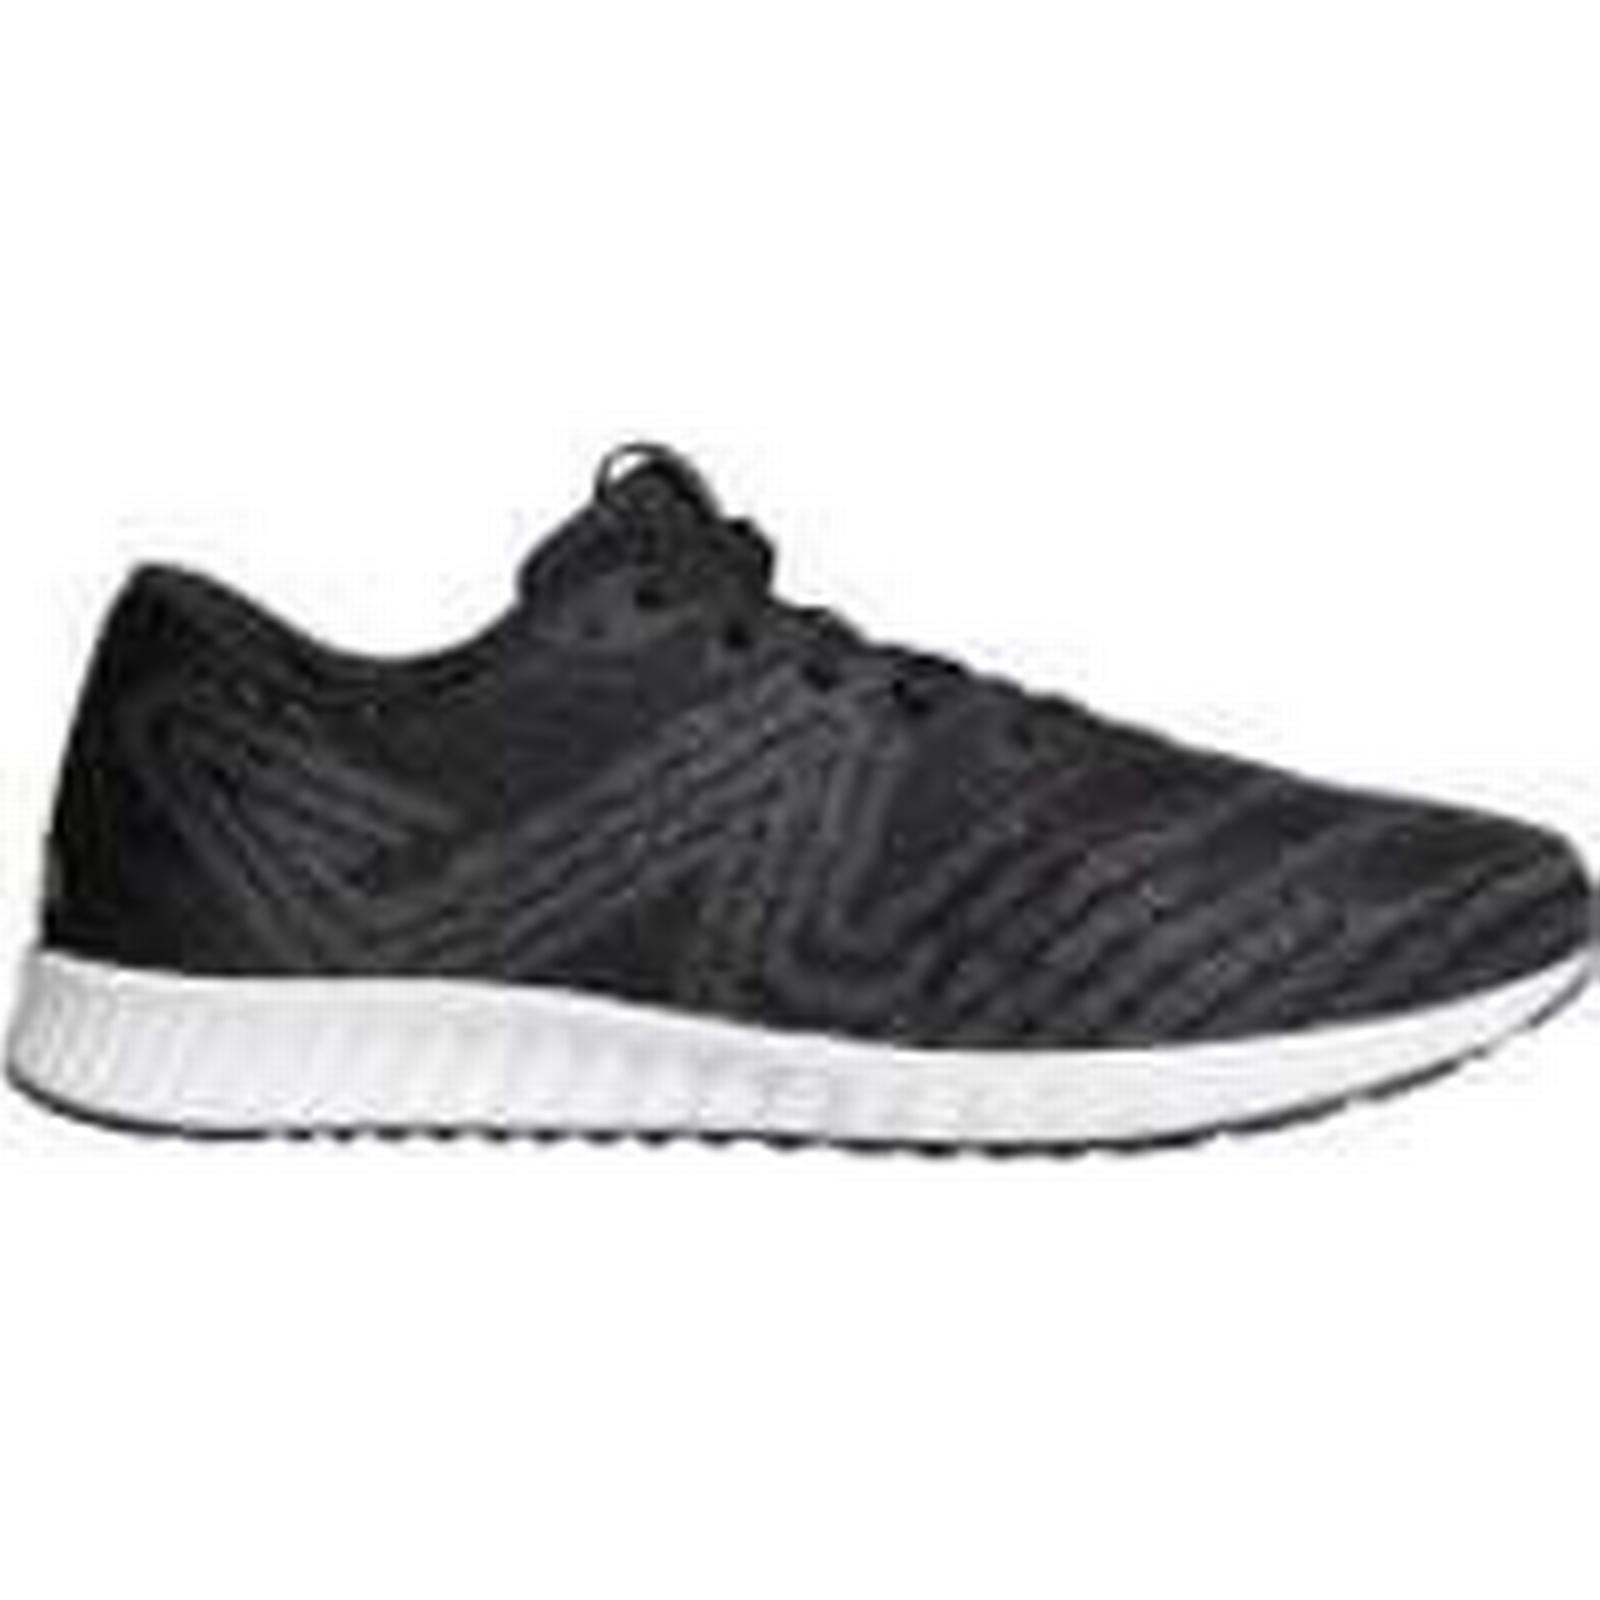 Adidas Women's Aerobounce Black PR Training Shoes - Black Aerobounce - US 6/UK 4.5 - Black 4c508a